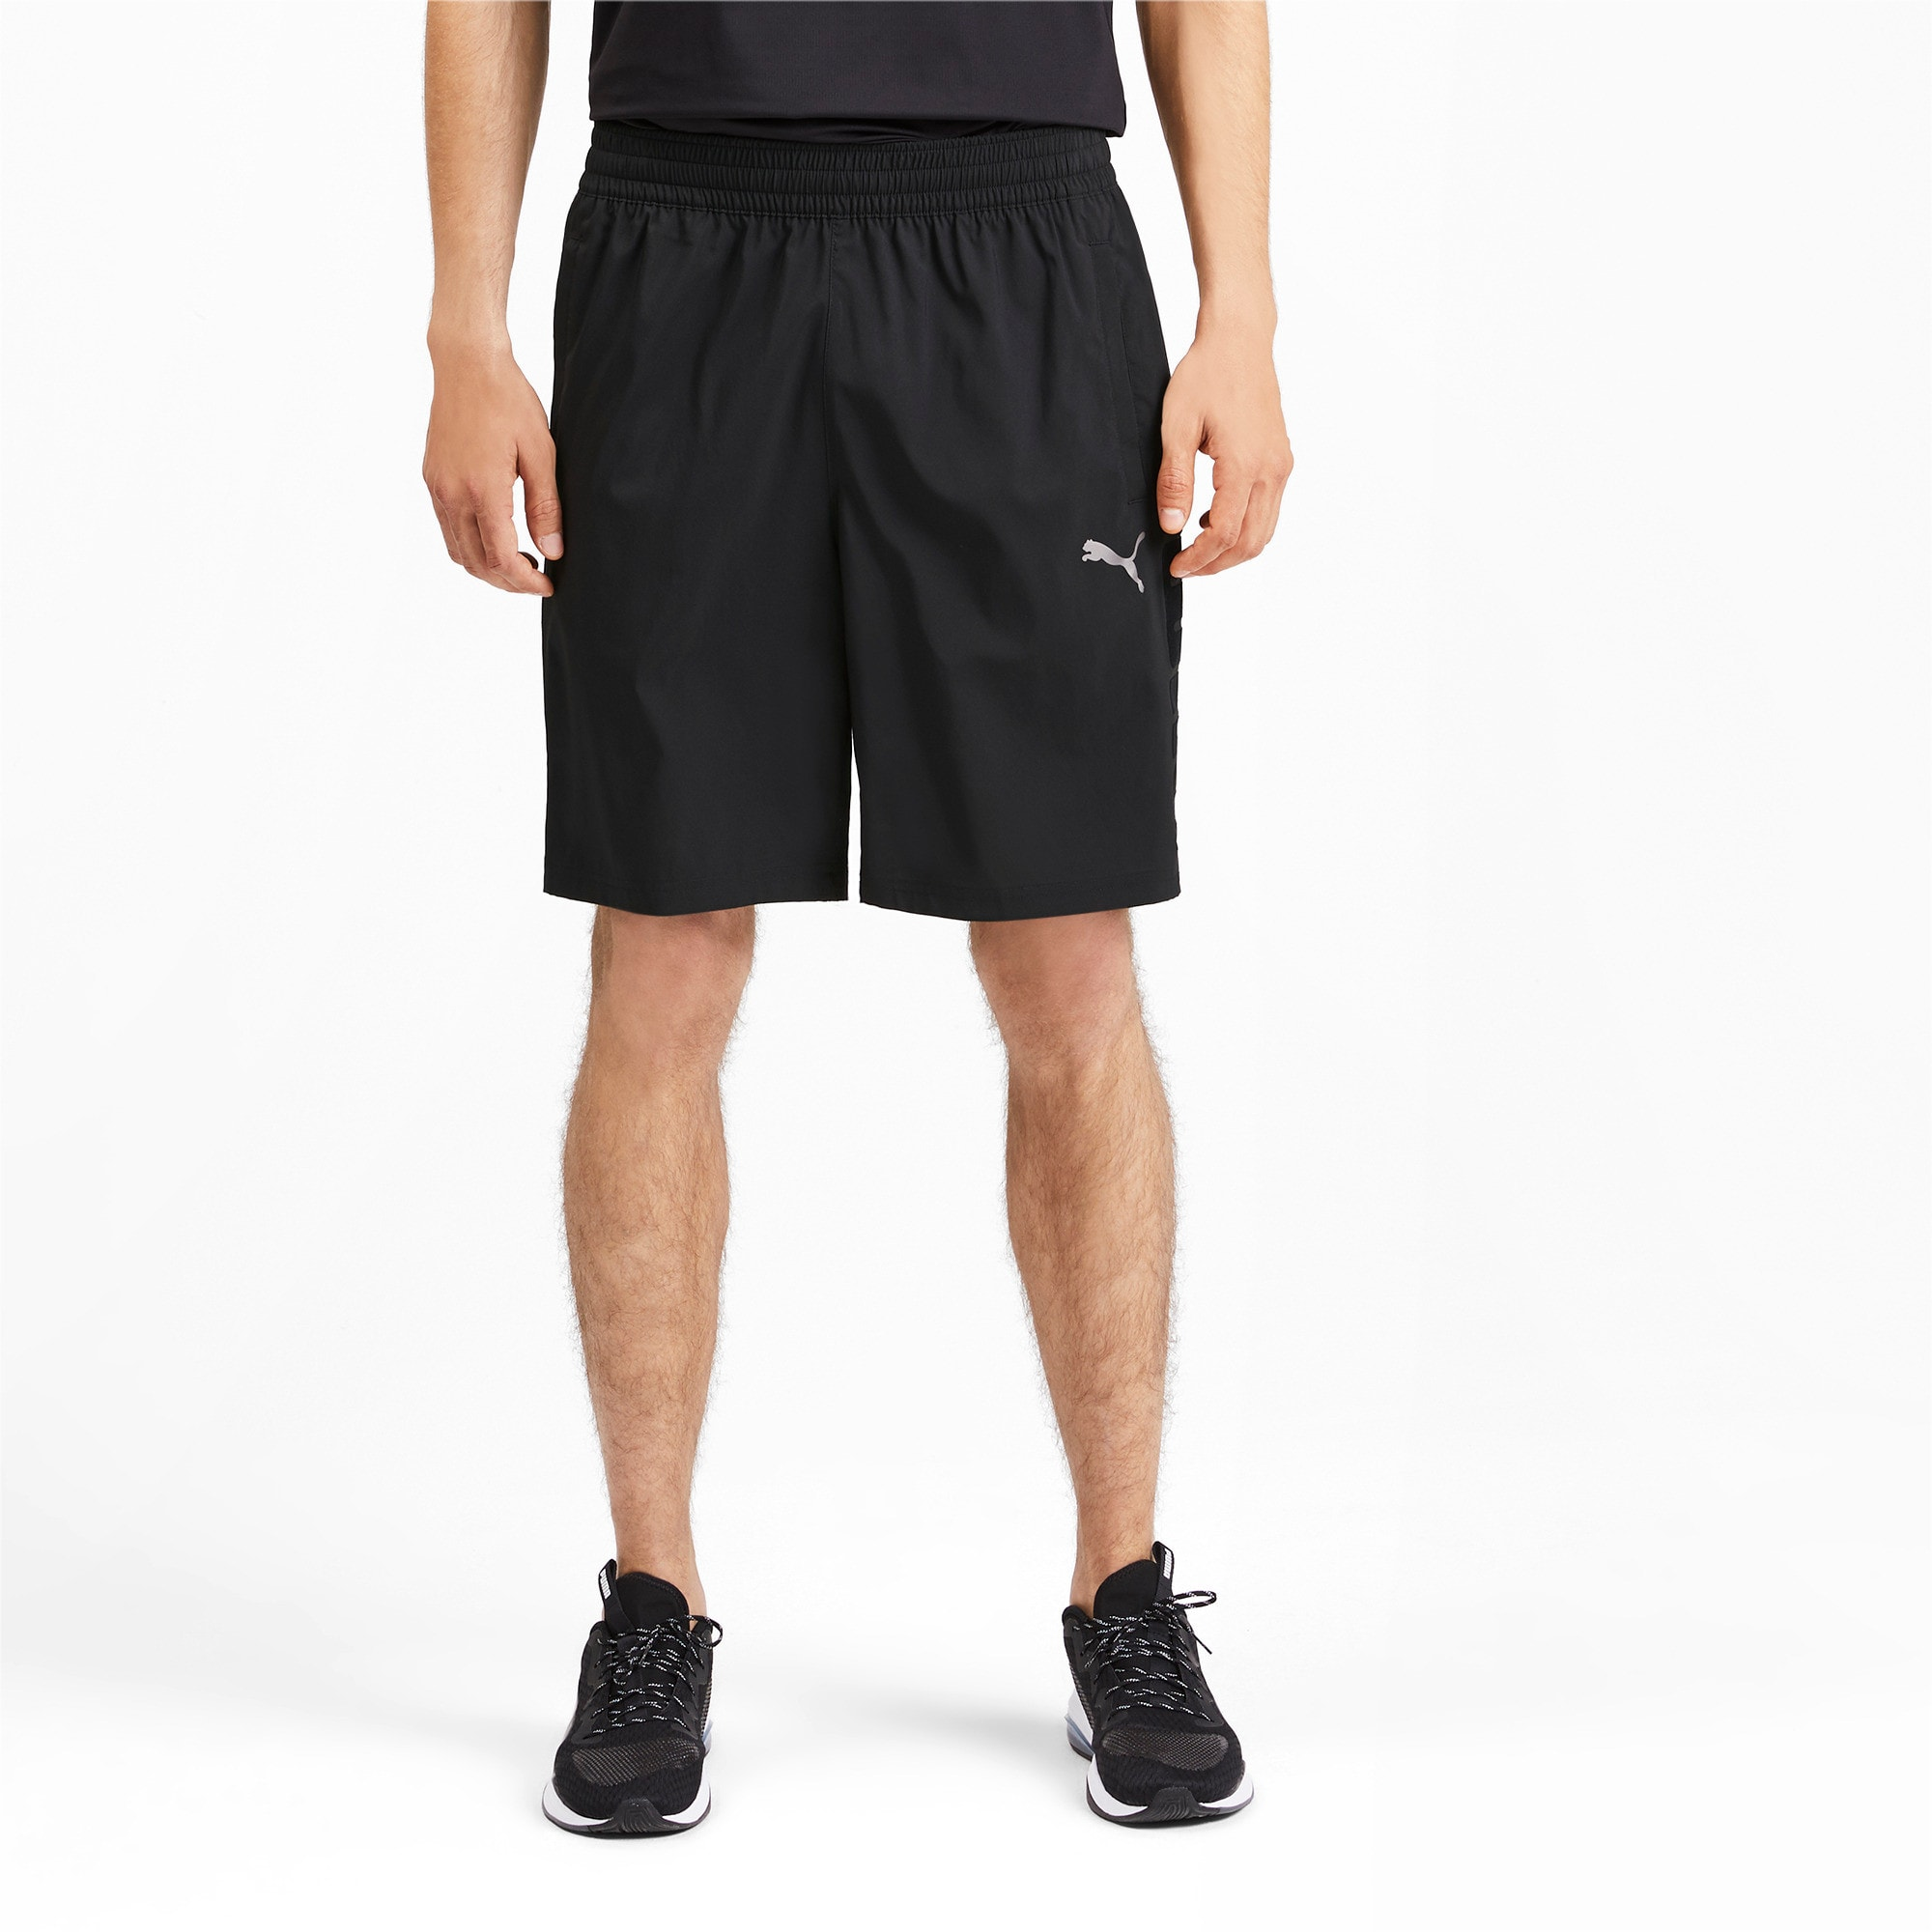 Thumbnail 1 of Power BND Men's Shorts, Puma Black, medium